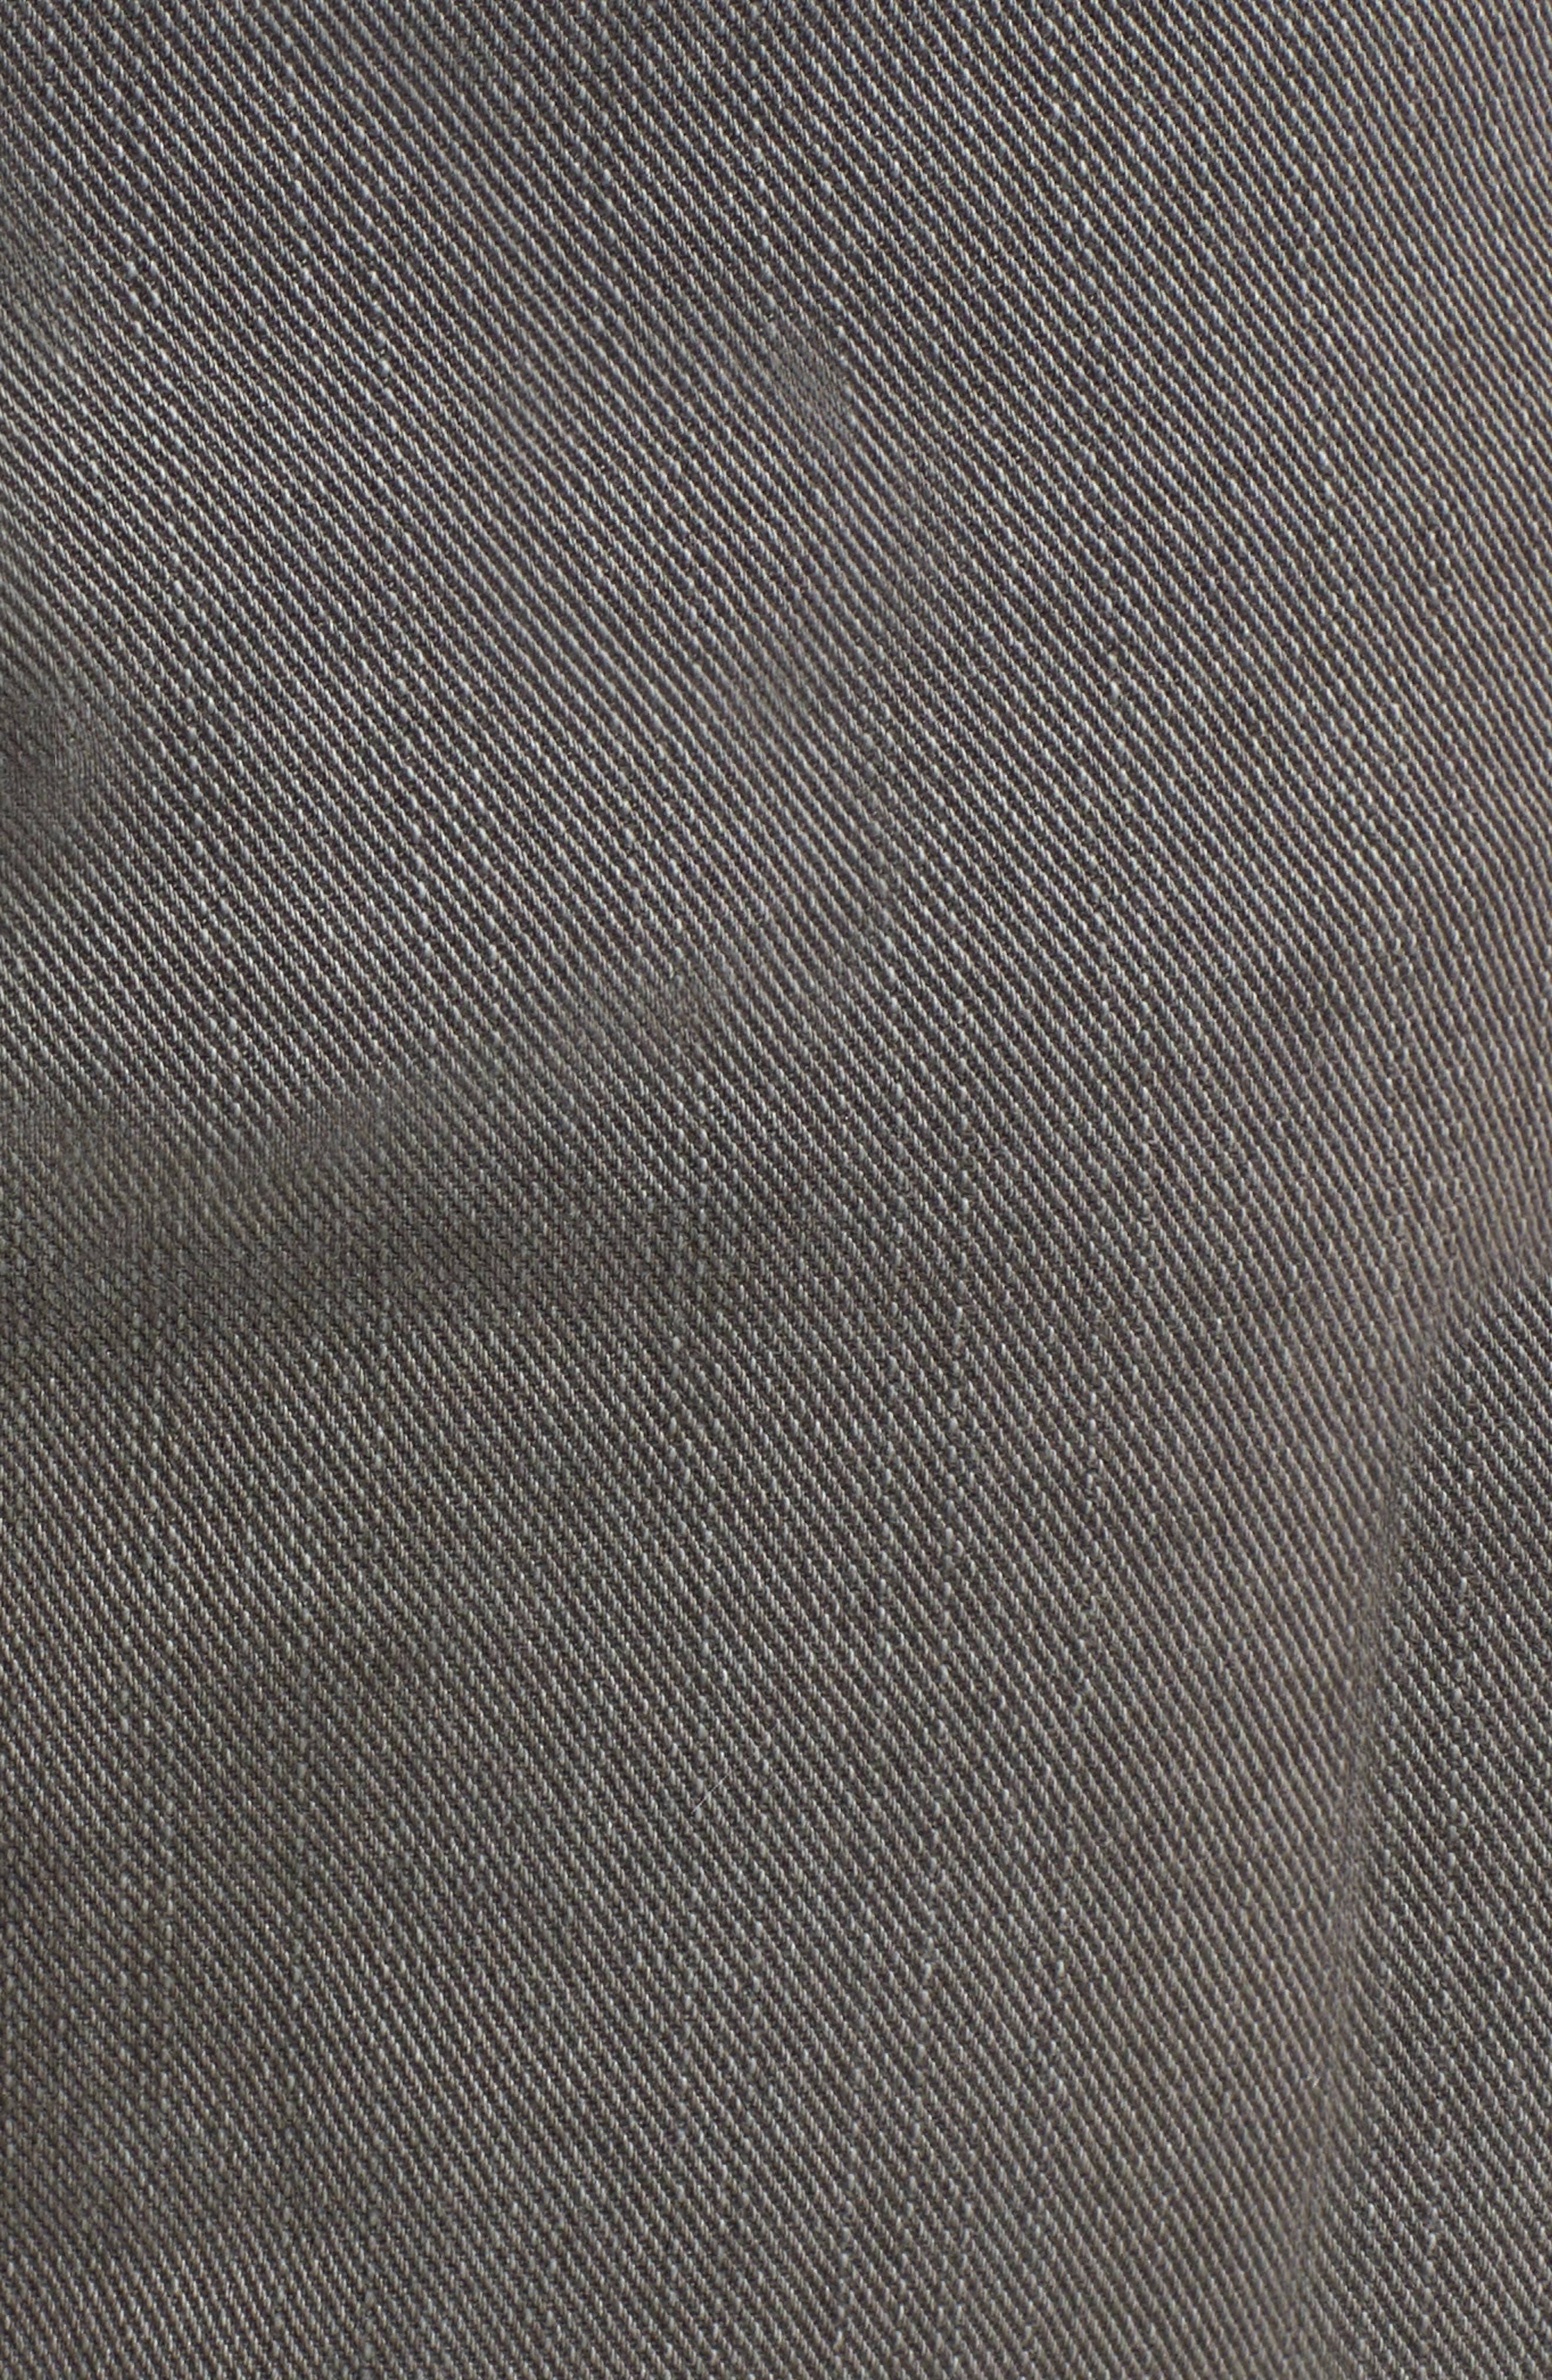 Regent Relaxed Fit Jeans,                             Alternate thumbnail 5, color,                             GUNMETAL